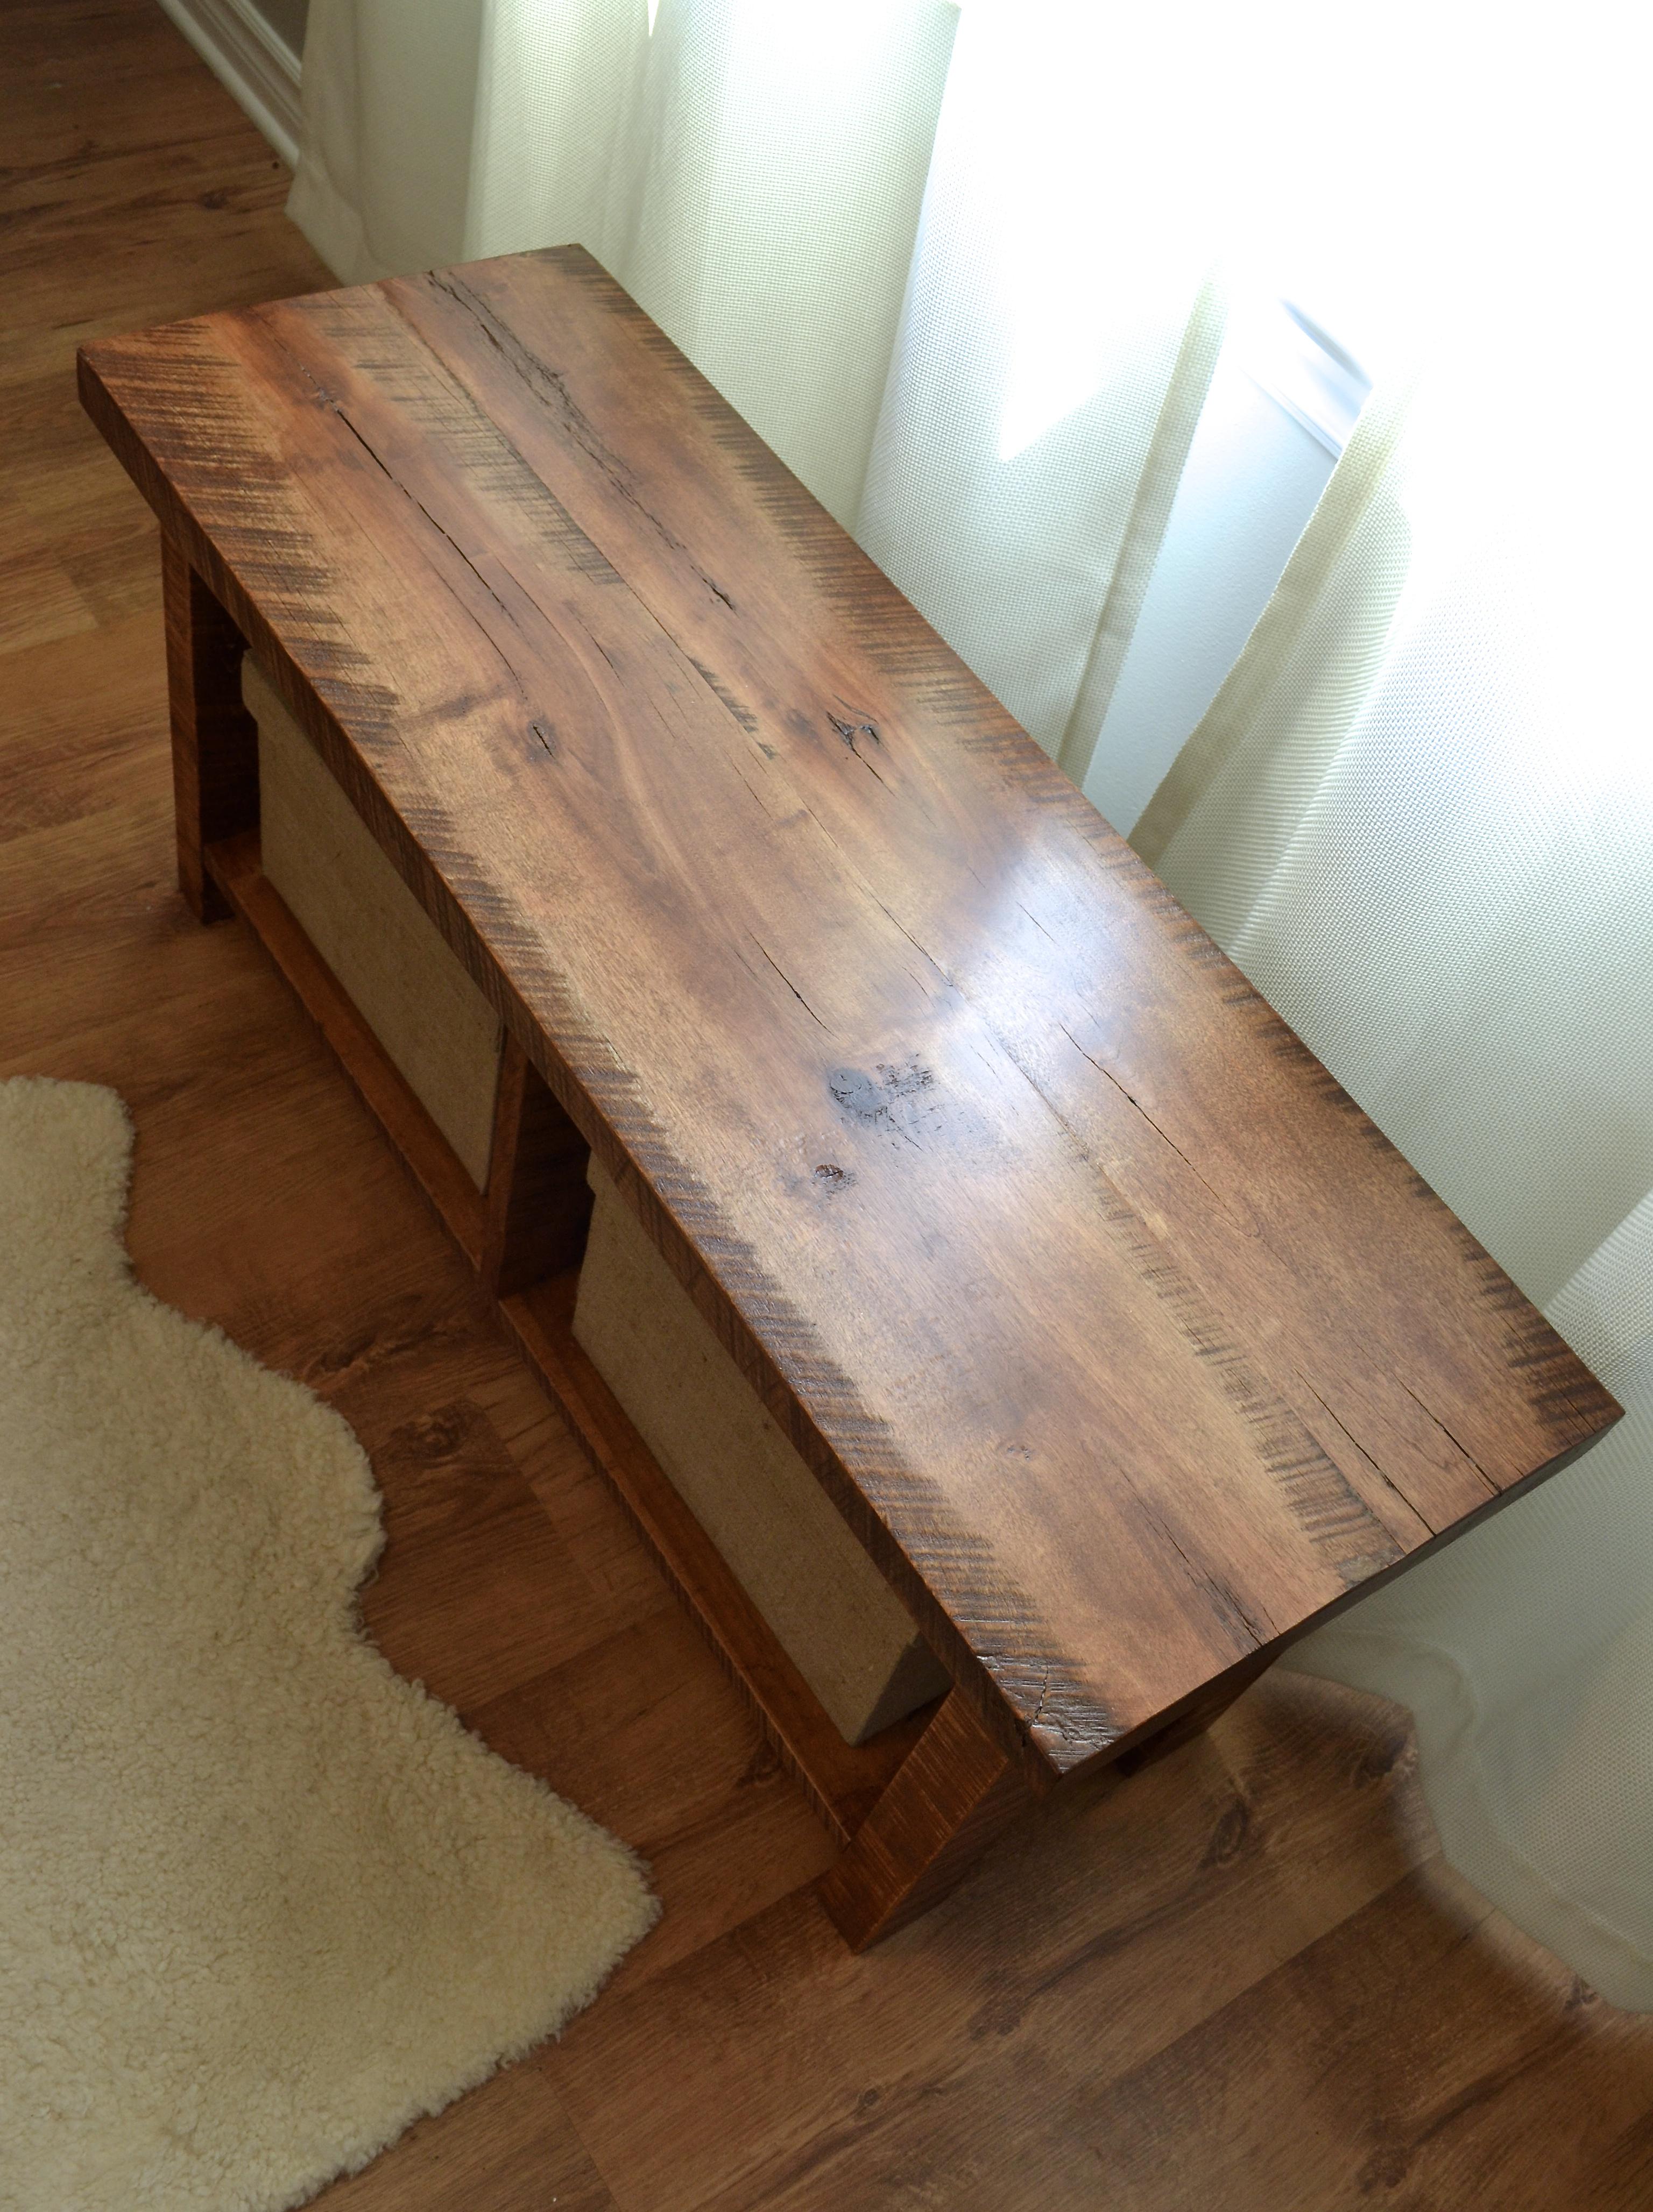 Rough-cut maple bench